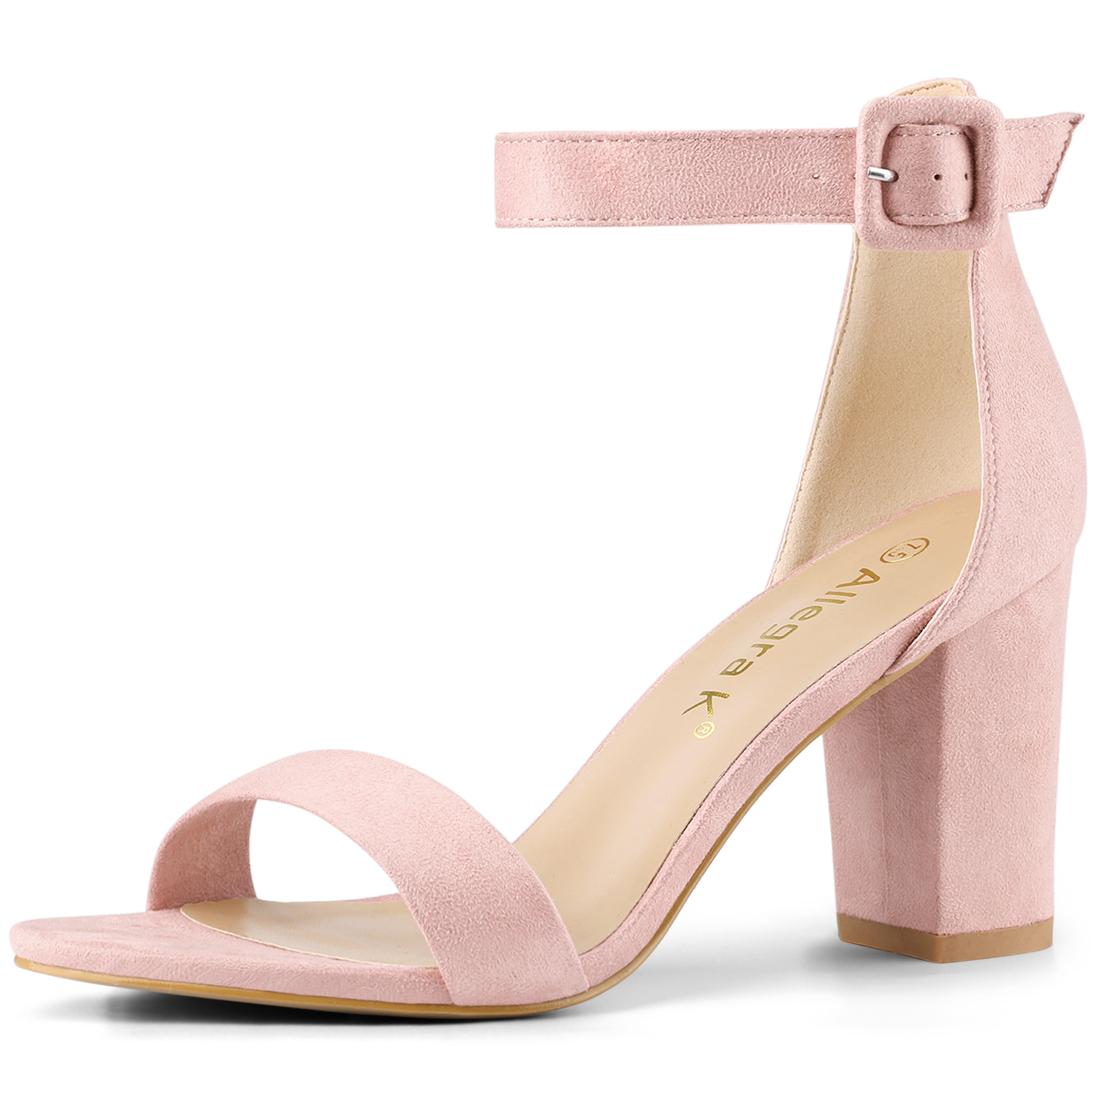 Allegra K Women's Chunky High Heel Ankle Strap Sandals Light Pink US 10